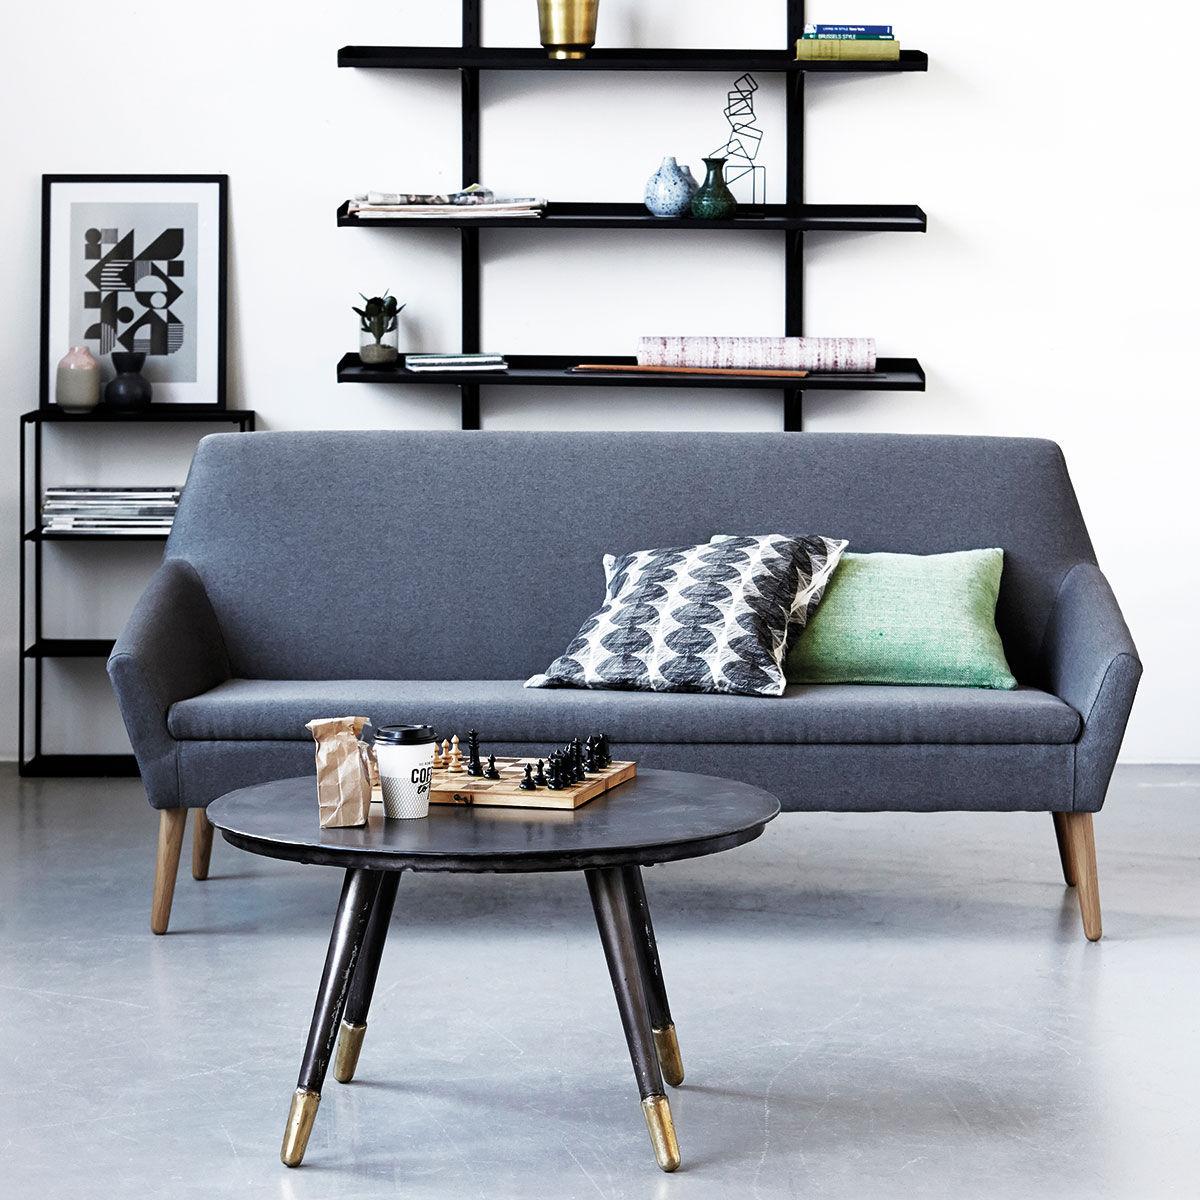 kant sofa 3 sitzer l 180 cm stoff eiche grau meliert f e eiche by house doctor. Black Bedroom Furniture Sets. Home Design Ideas